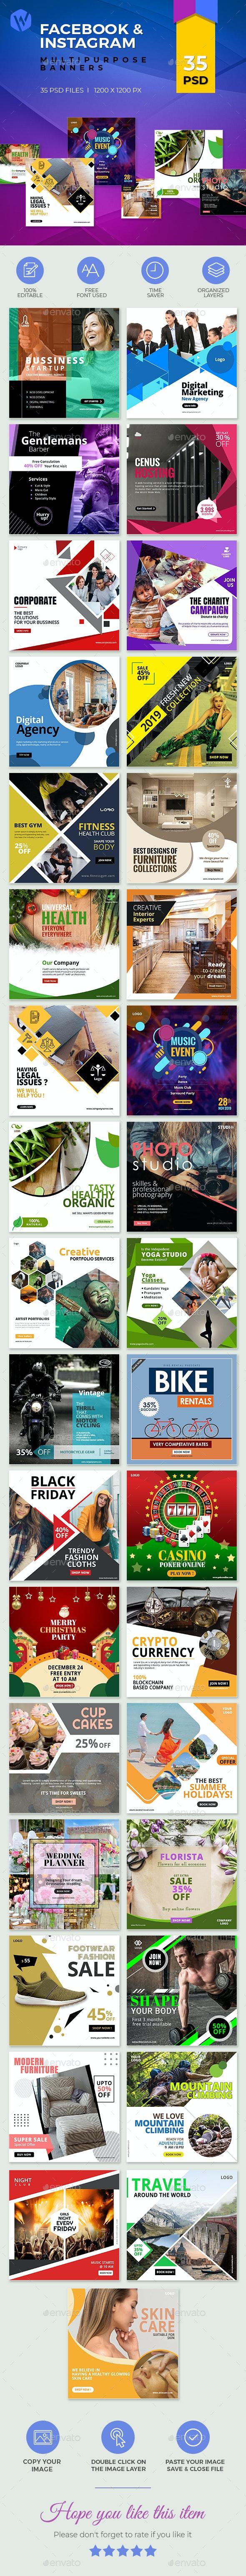 35-Facebook & Instagram Banners - Social Media Web Elements